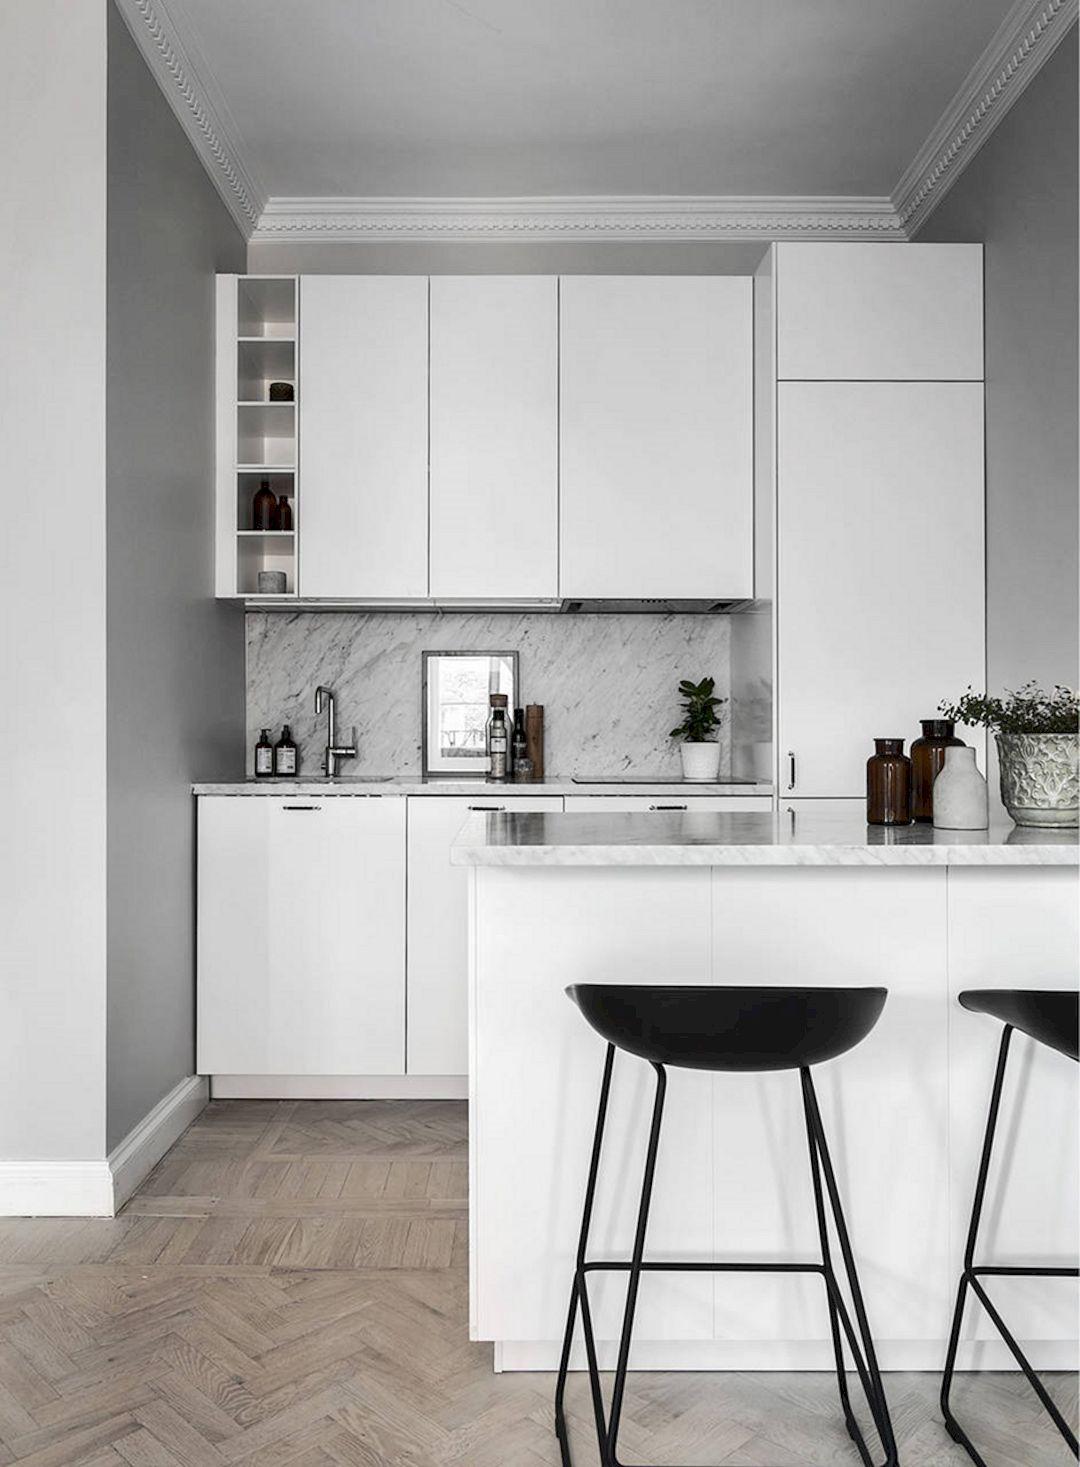 astonishing small dining room designs https futuristarchitecture also gorgeous kitchen design ideas for house rh pinterest